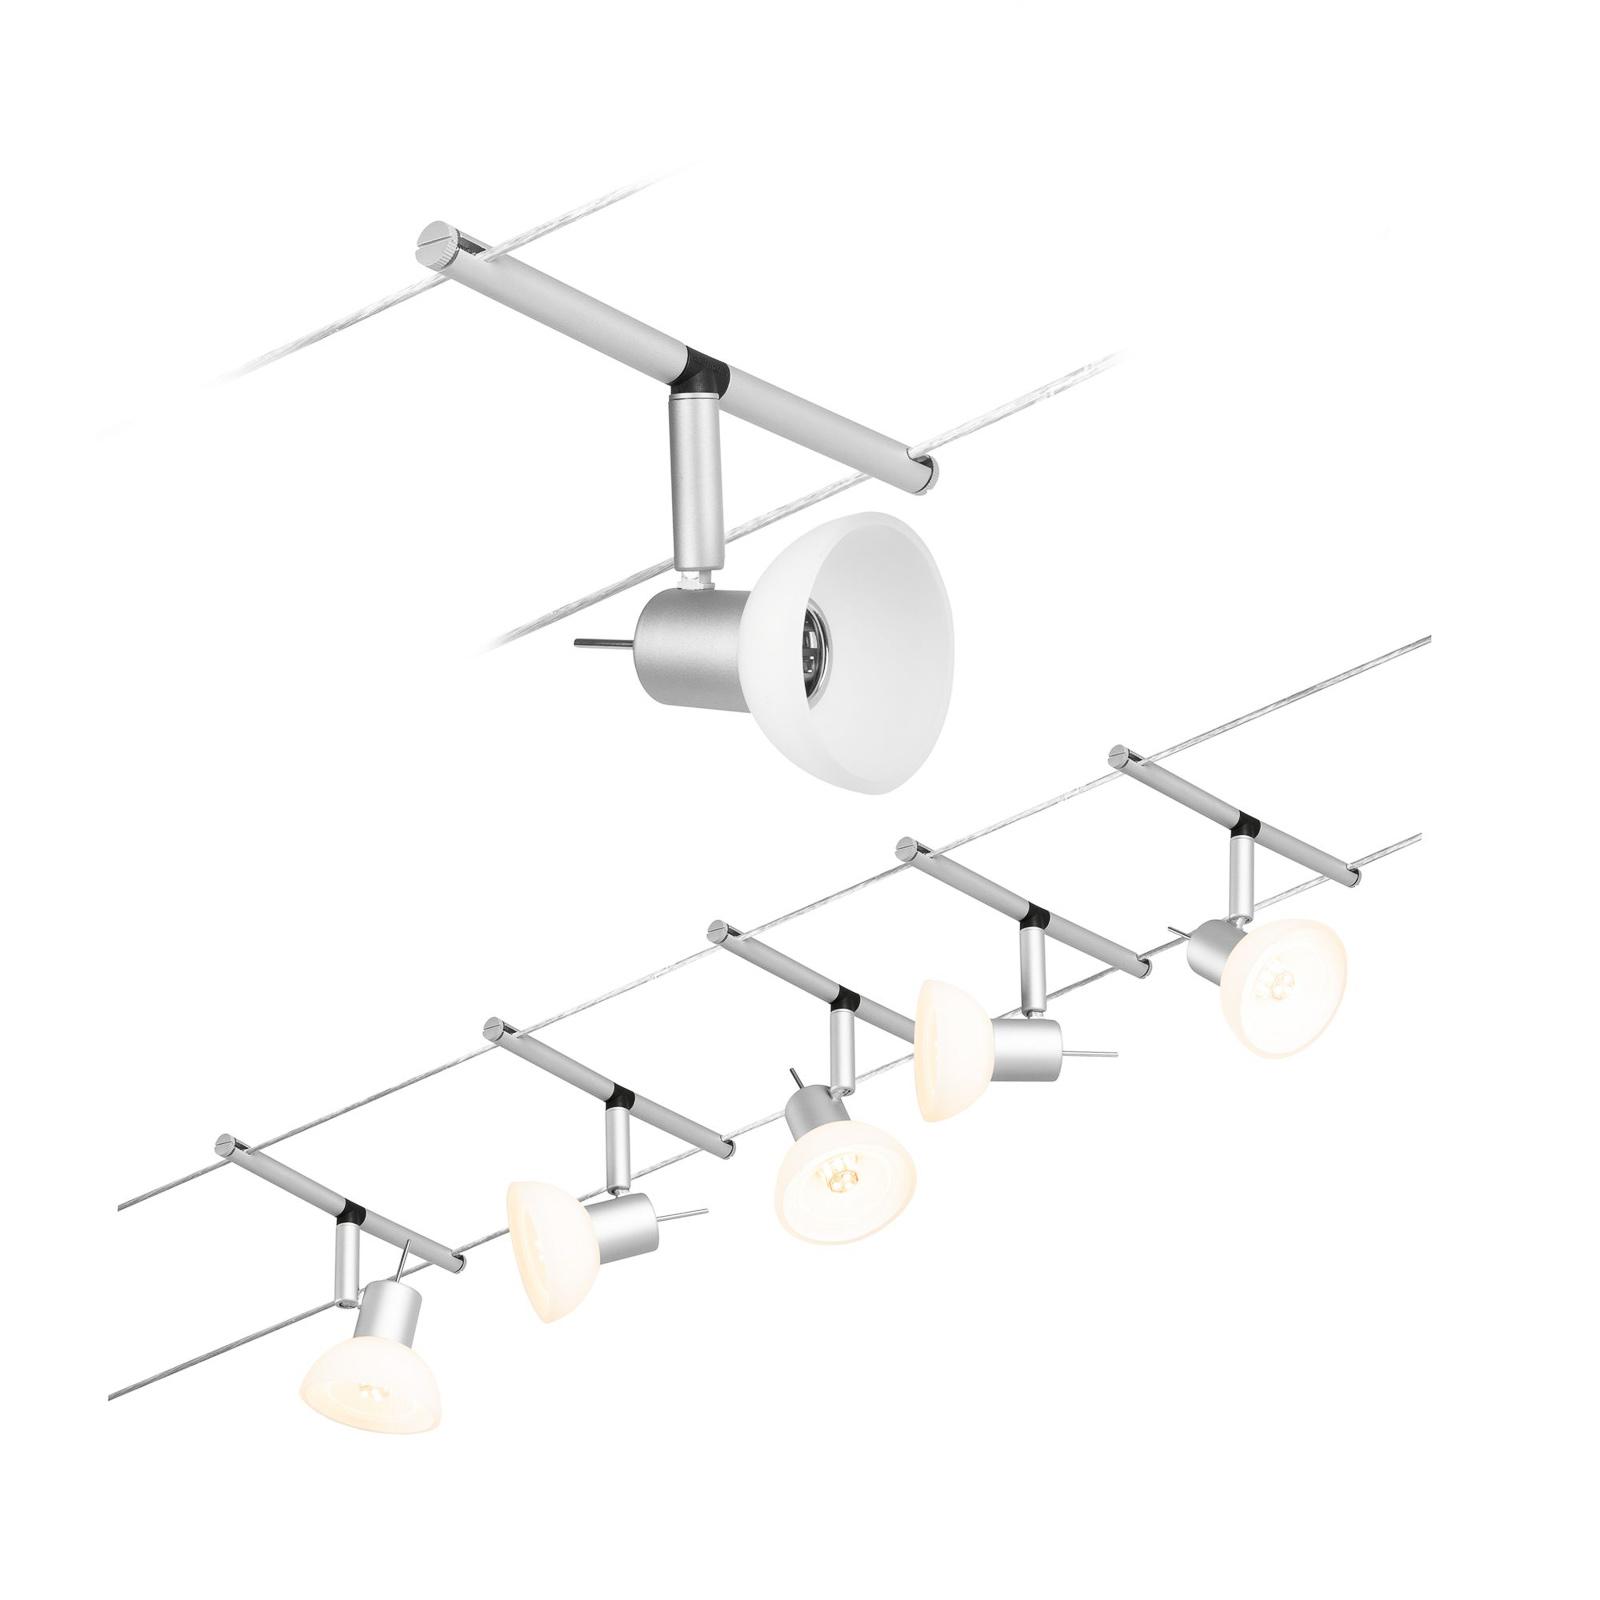 Paulmann Wire Sheela Seilsystem, 5-fl. 5 m chrom